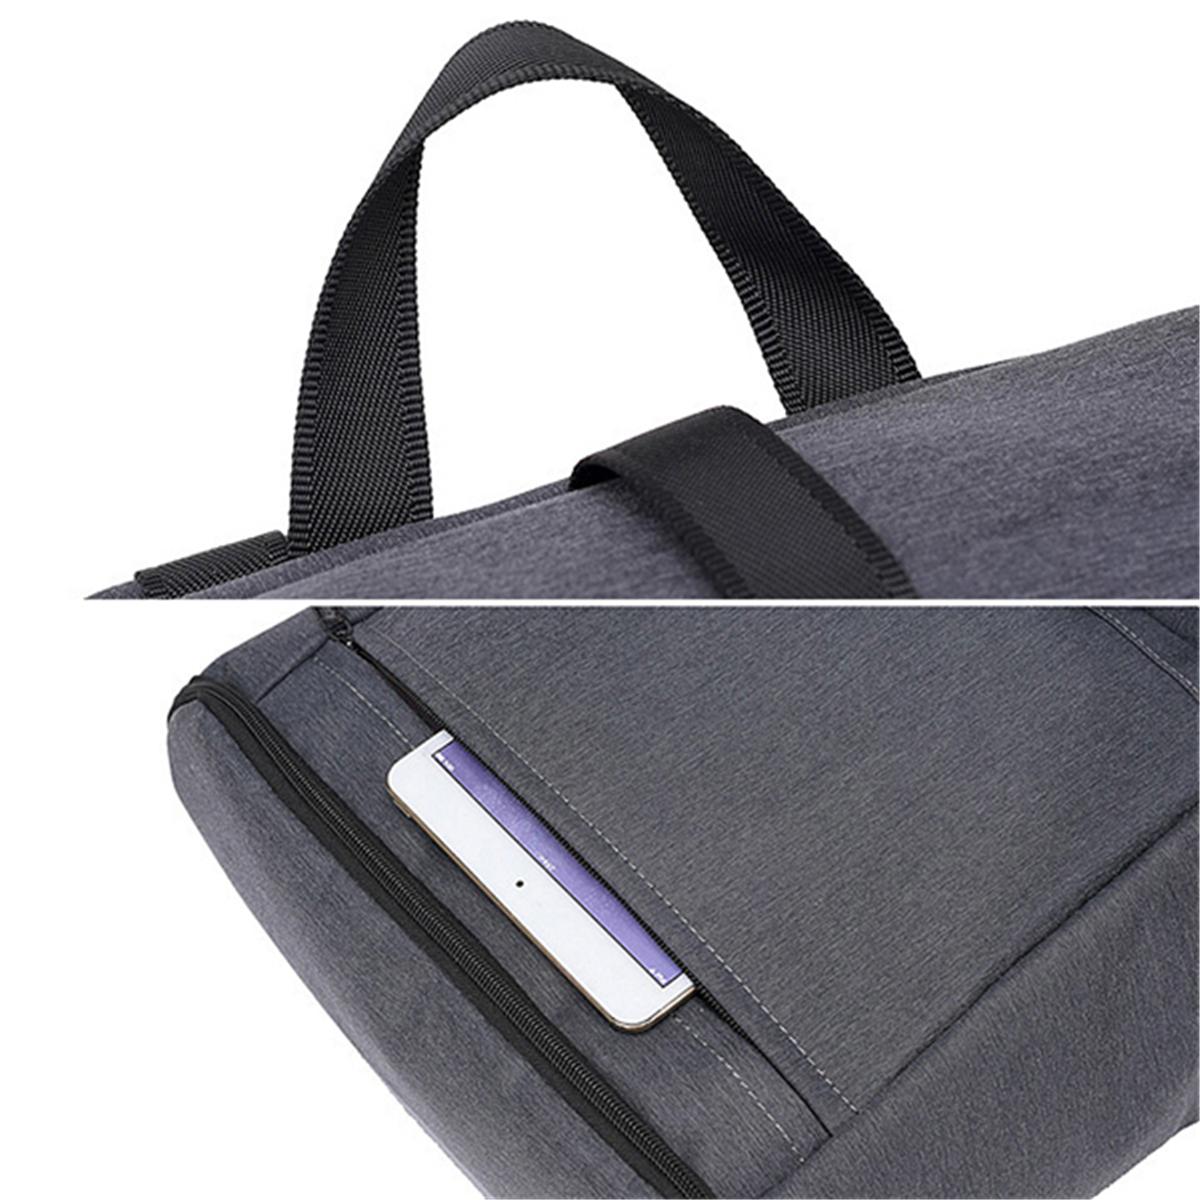 Oxford Large Capacity 17 Inches Laptop Bag USB Charging Bag